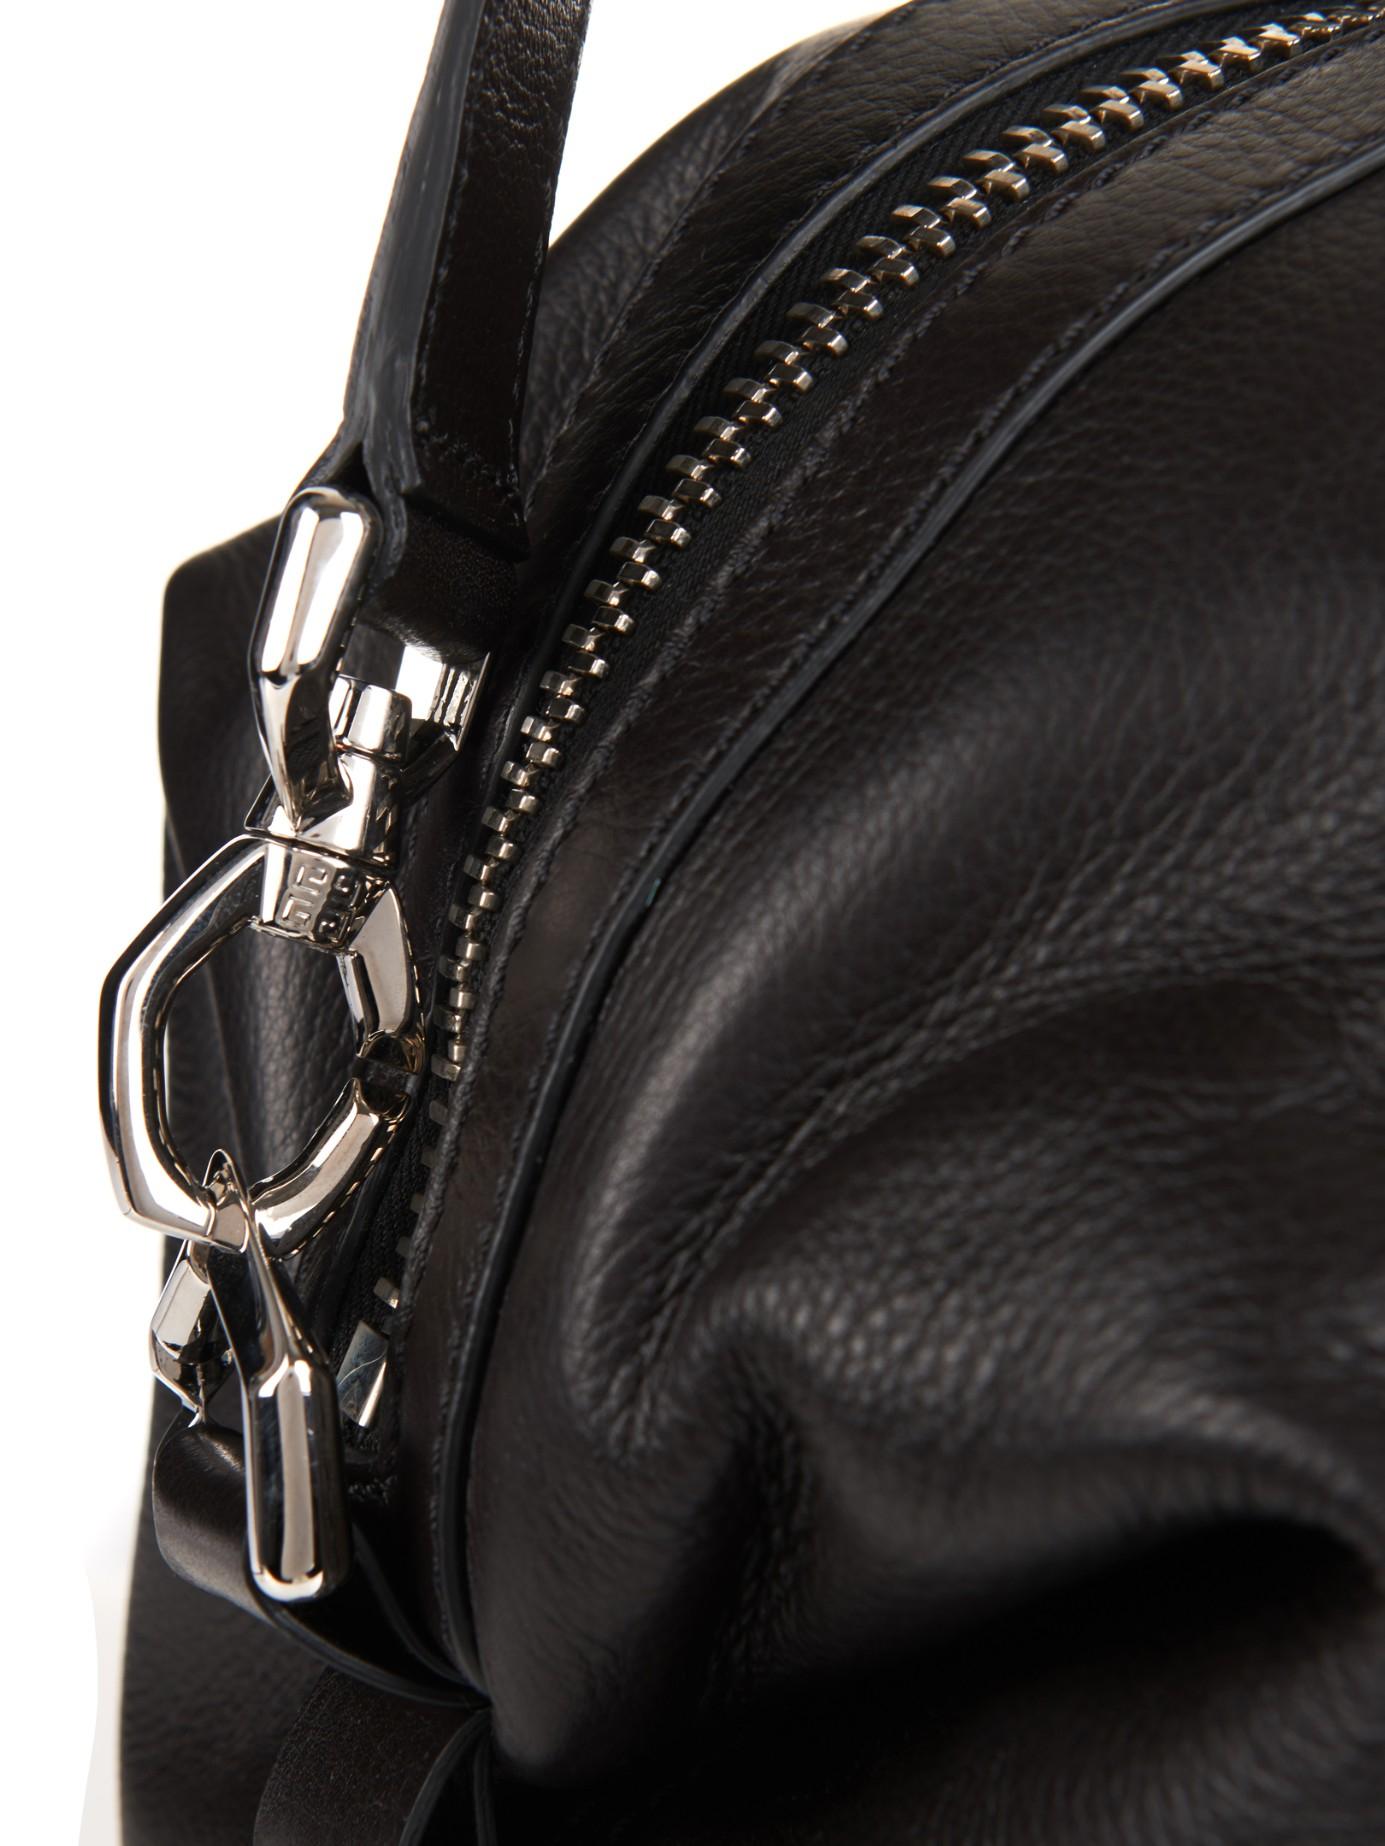 Lyst - Givenchy Nightingale Leather Shoulder Bag in Black da9de0dd3324e